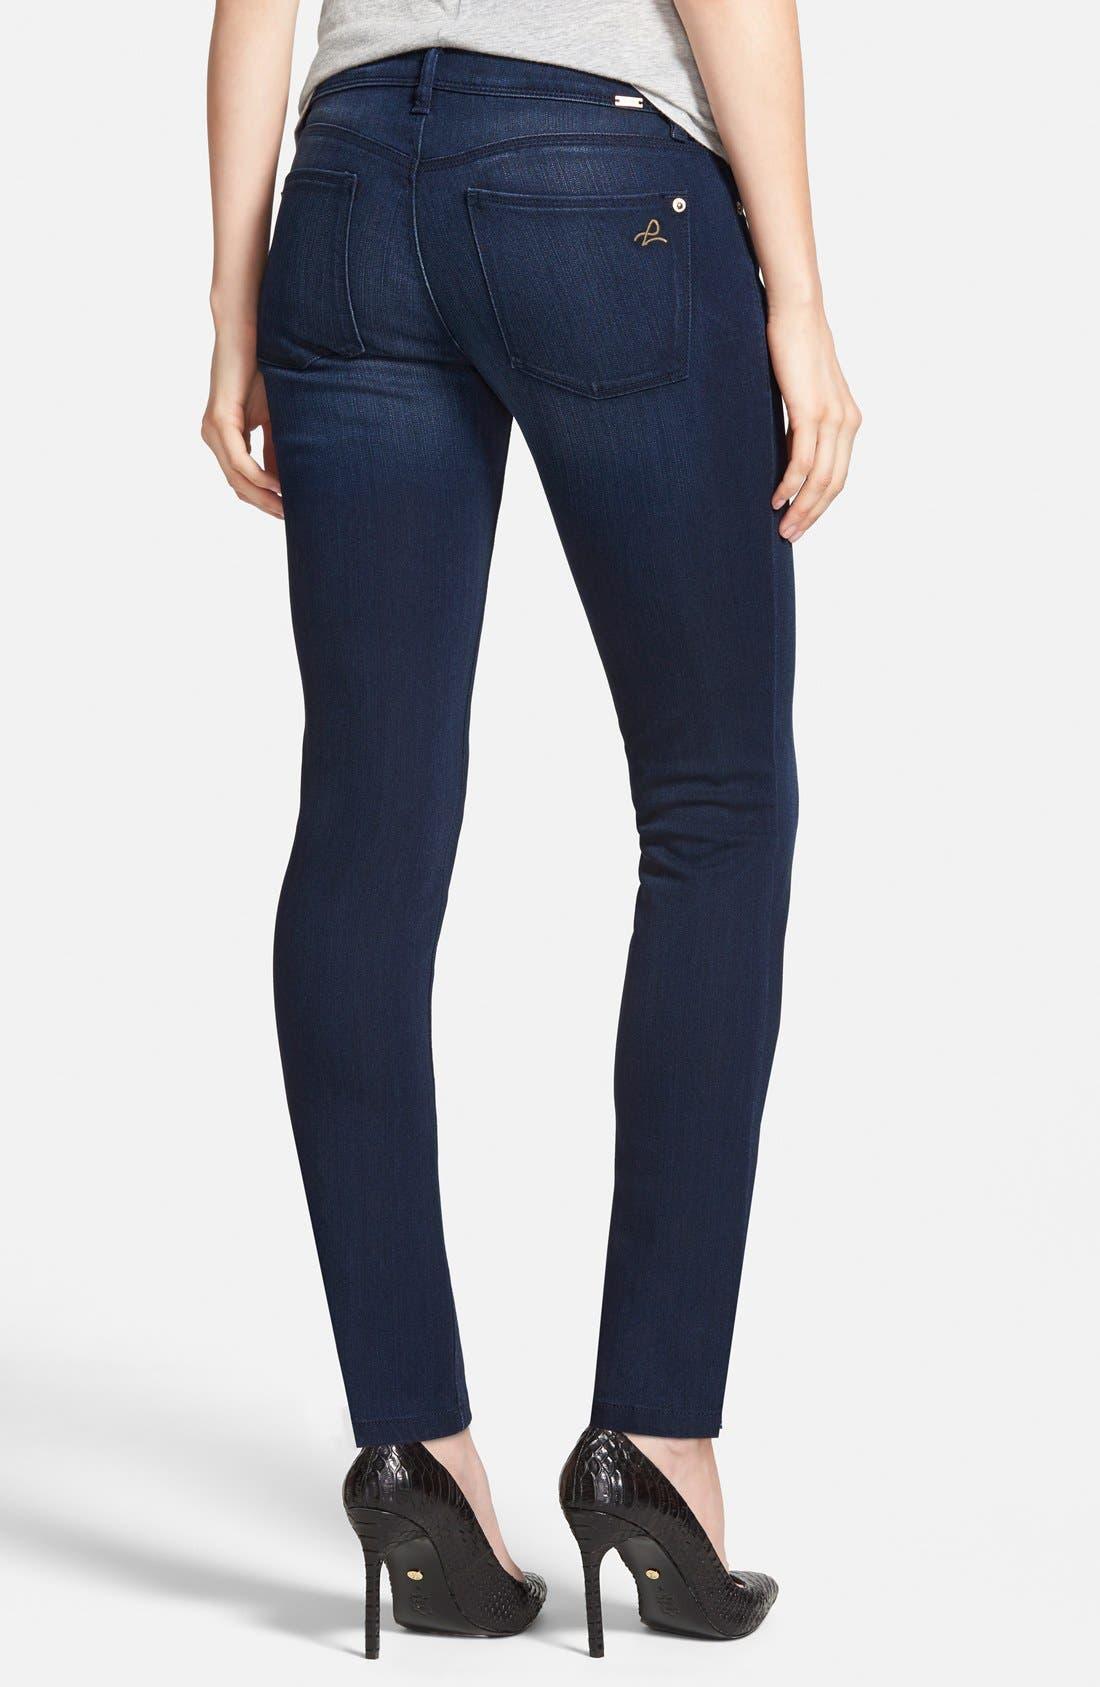 Alternate Image 2  - DL1961 'Emma' Power Legging Jeans (Berlin)